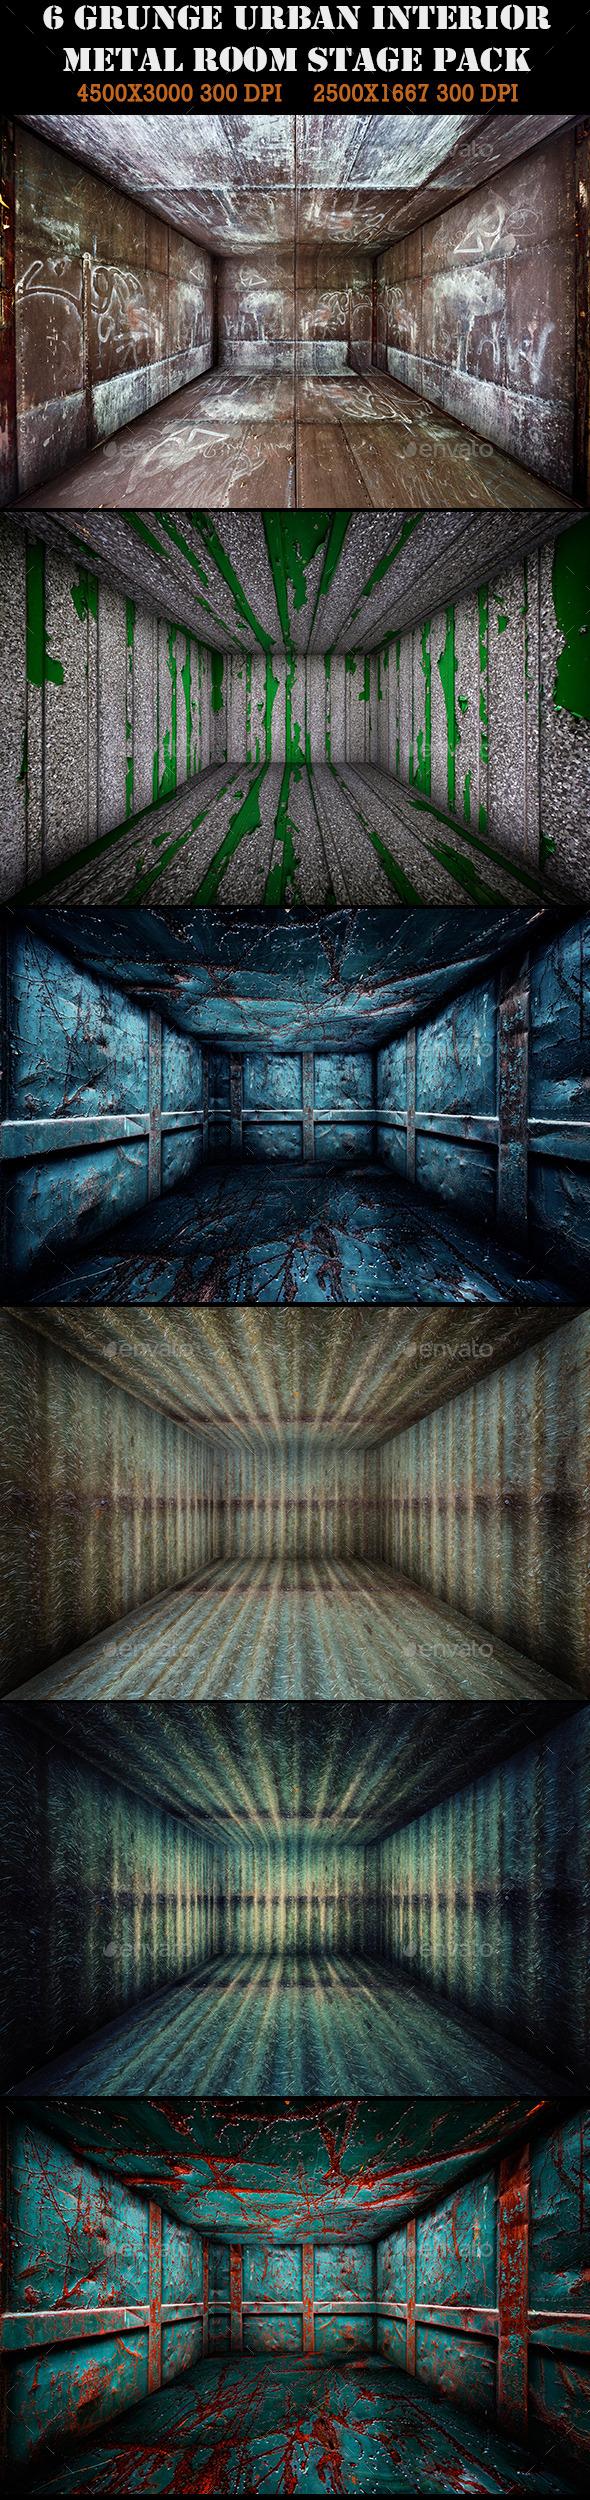 6 Grunge Urban Metal Room Interior Stage Pack - Urban Backgrounds